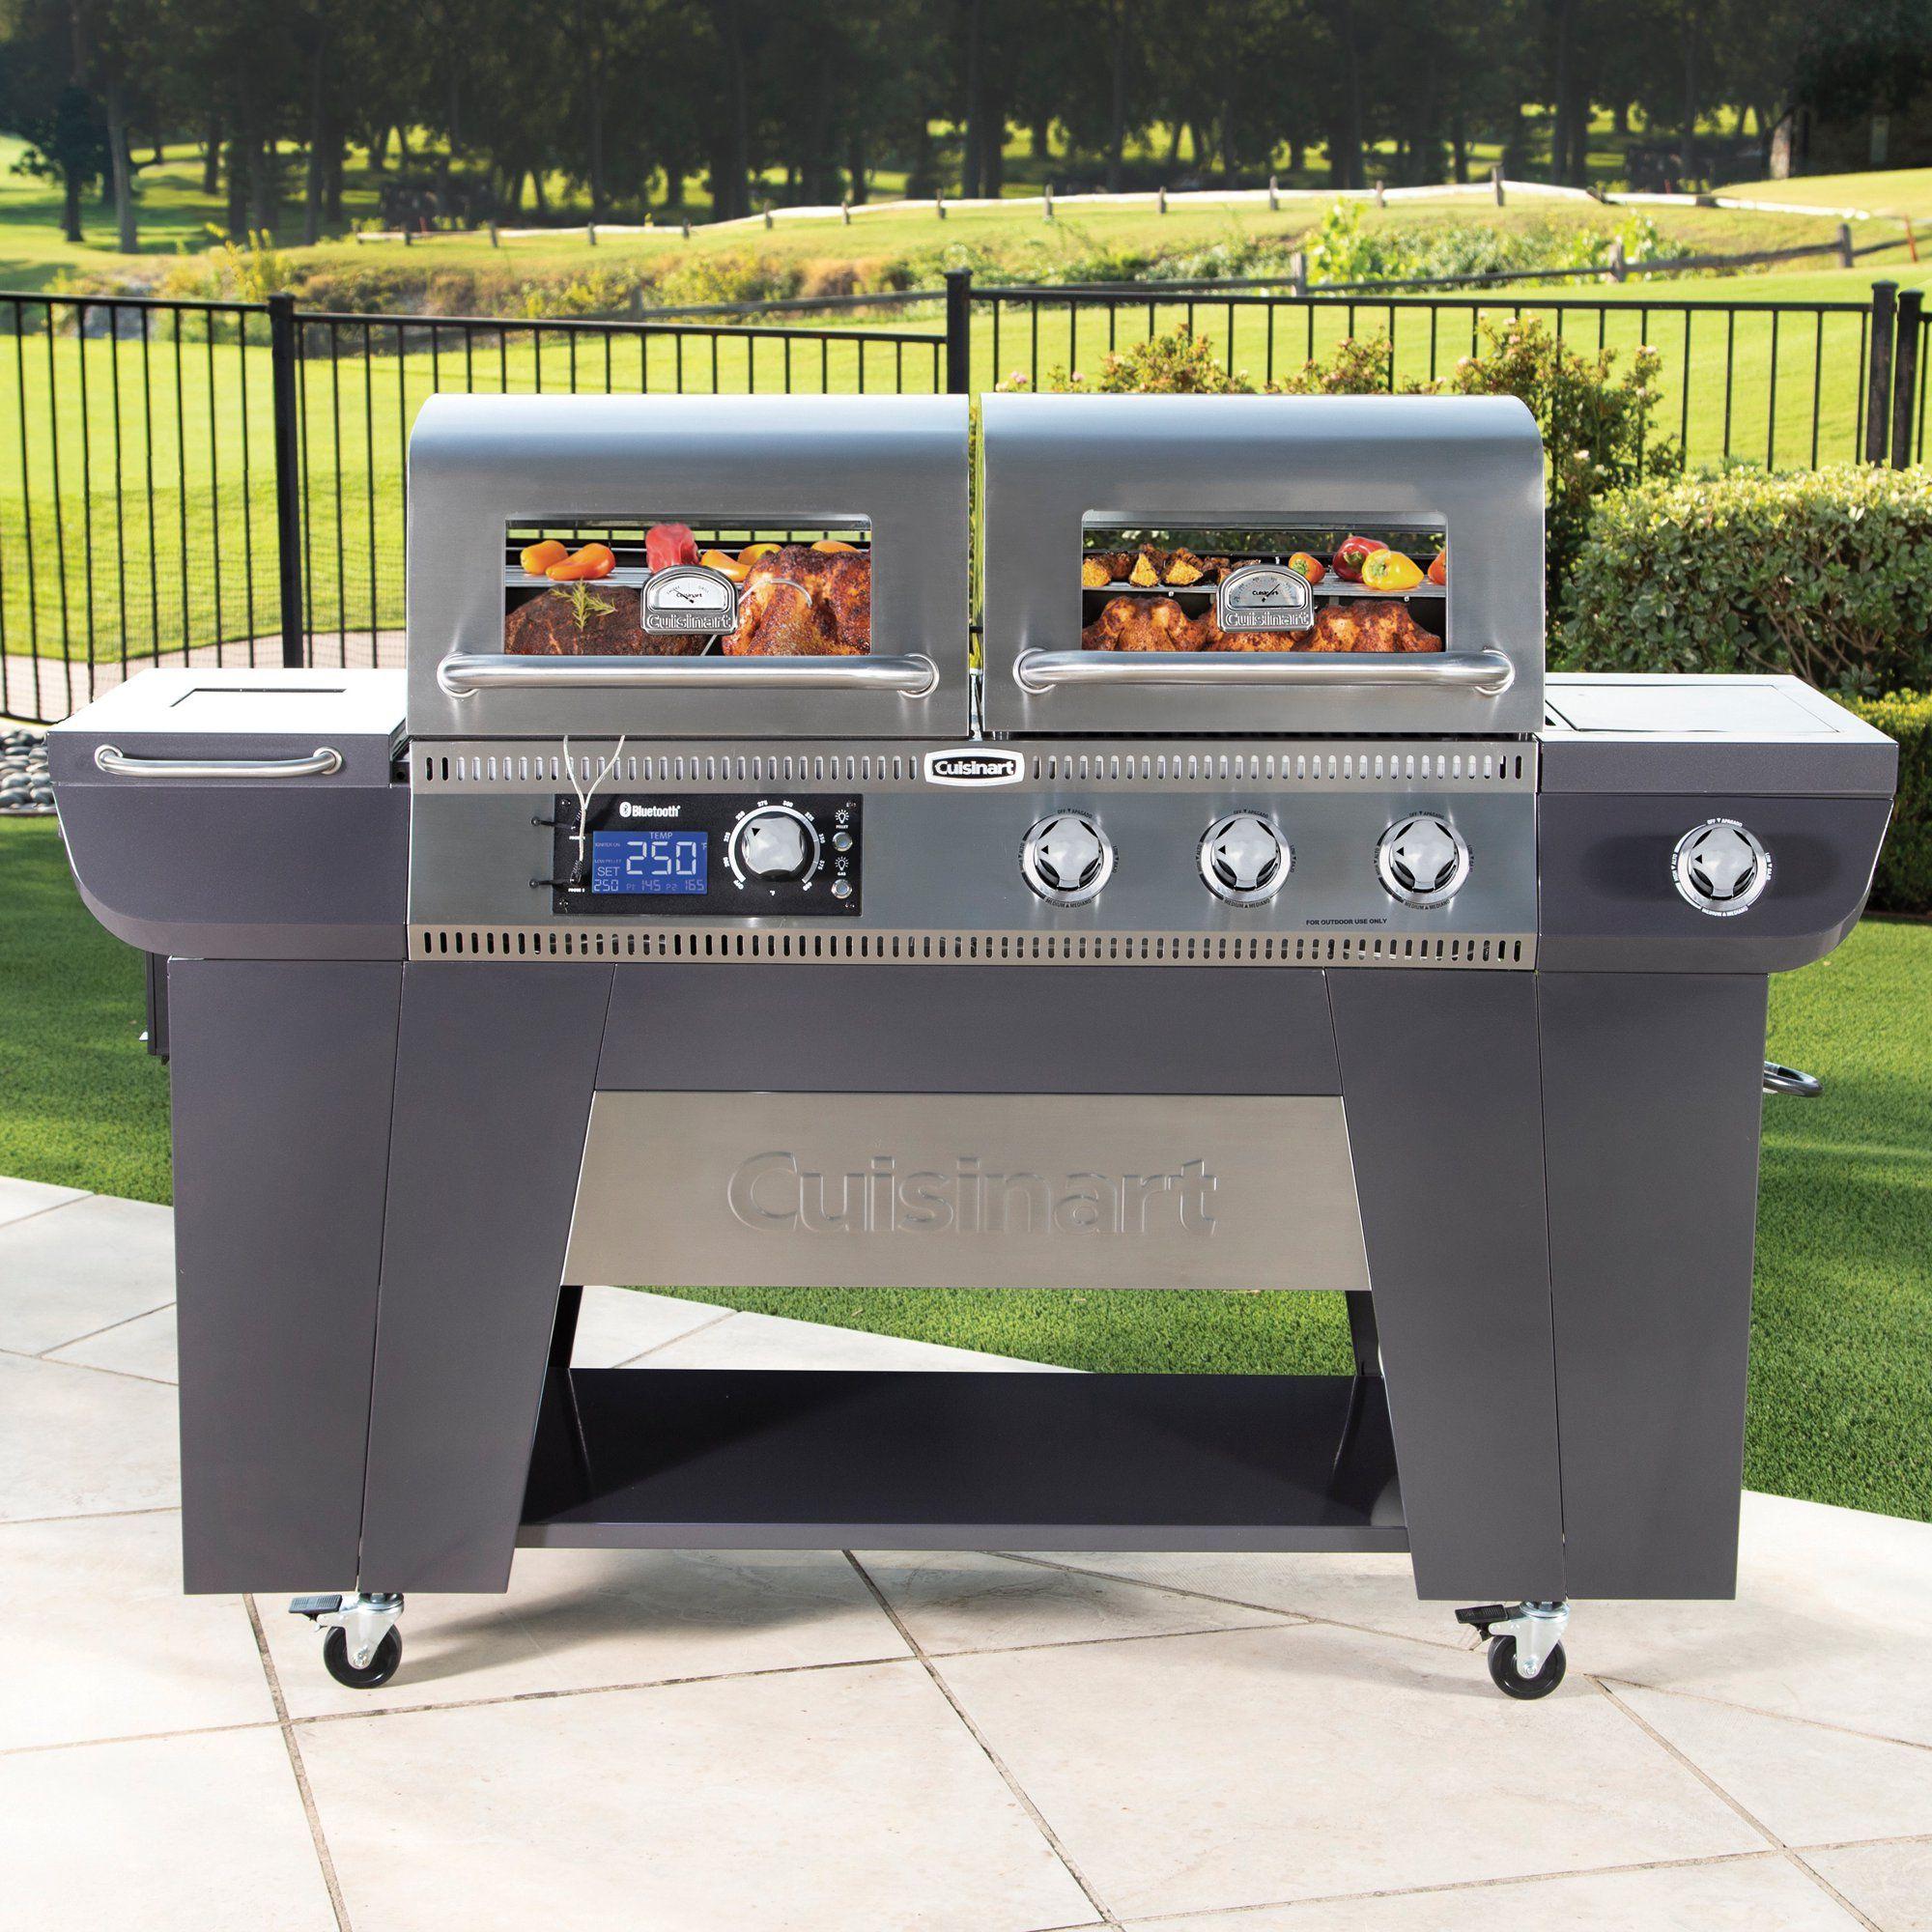 Cuisinart Twin Oaks Dual Function Pellet And Gas Grill Walmart Com Walmart Com In 2020 Simple Outdoor Kitchen Pellet Grill Diy Grill